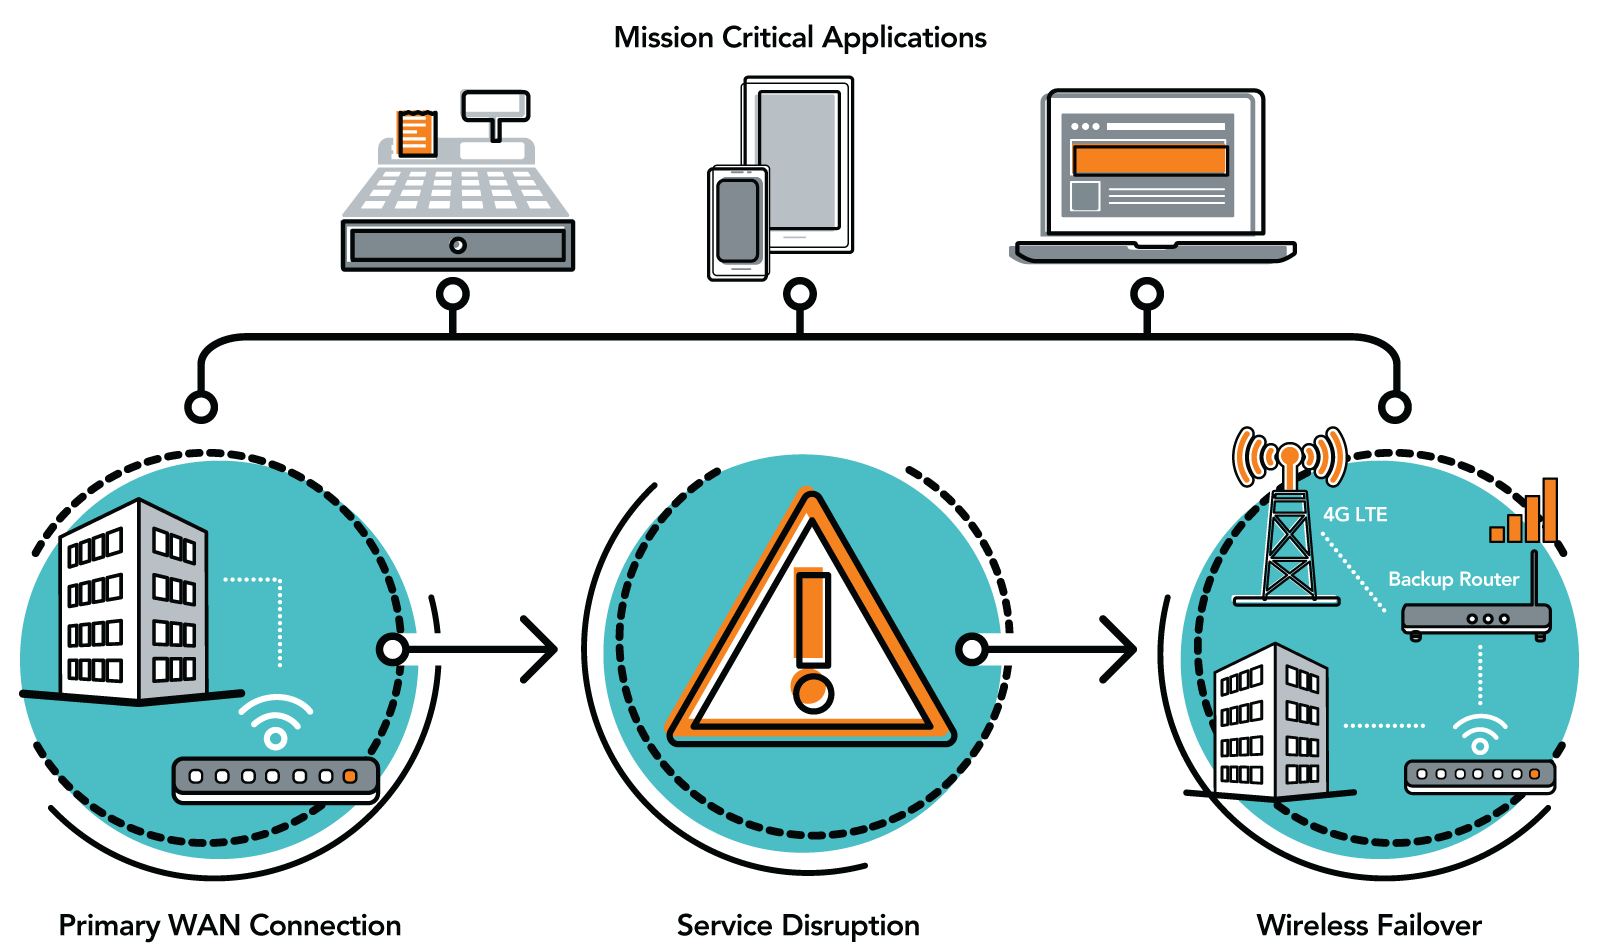 Prepare for wired internet service disruptions